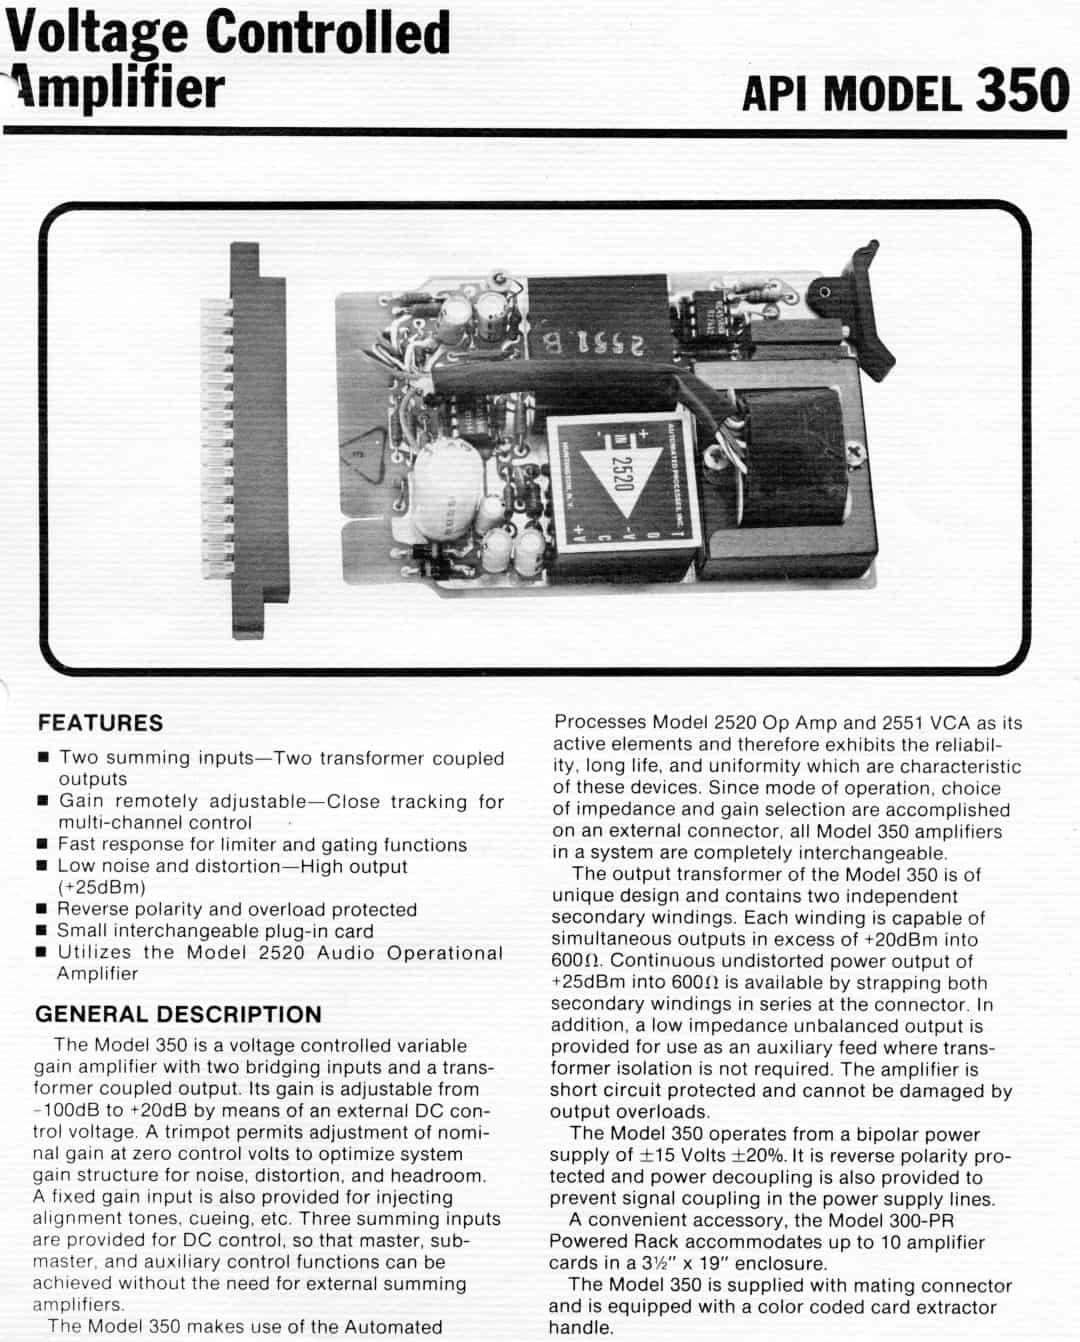 API 350 Brochure